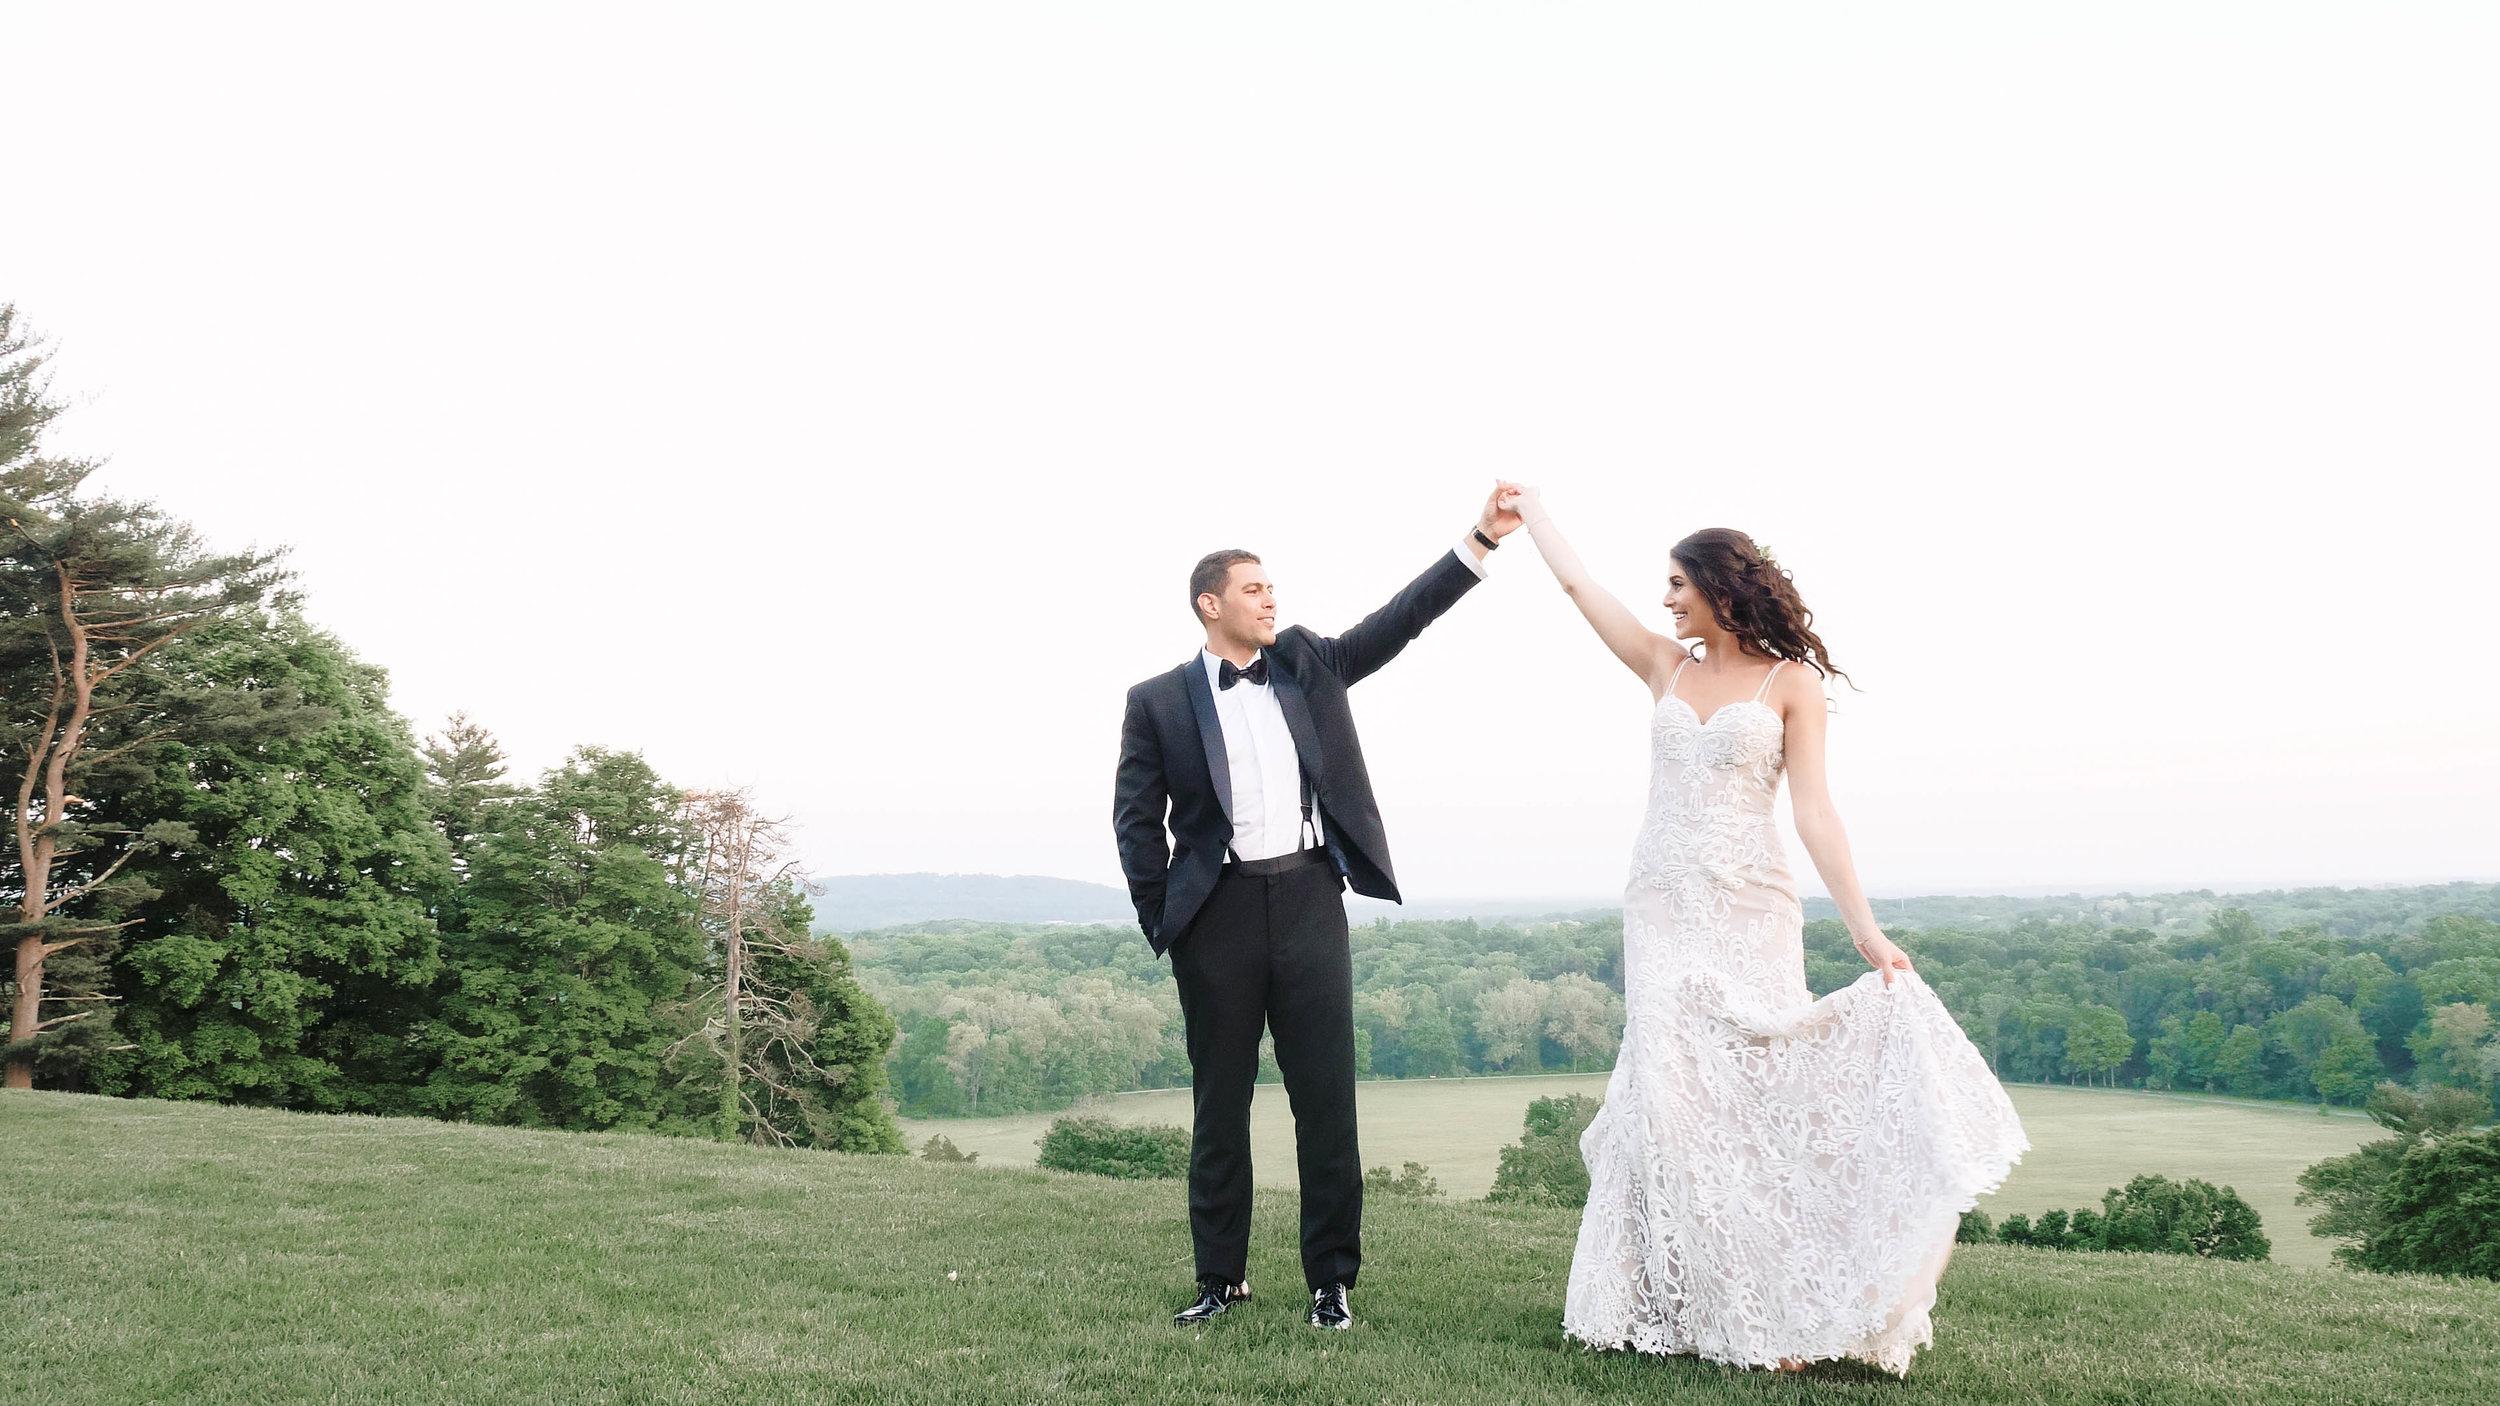 Natirar Wedding_Nicki and Jason_Tonemedia 3.jpg